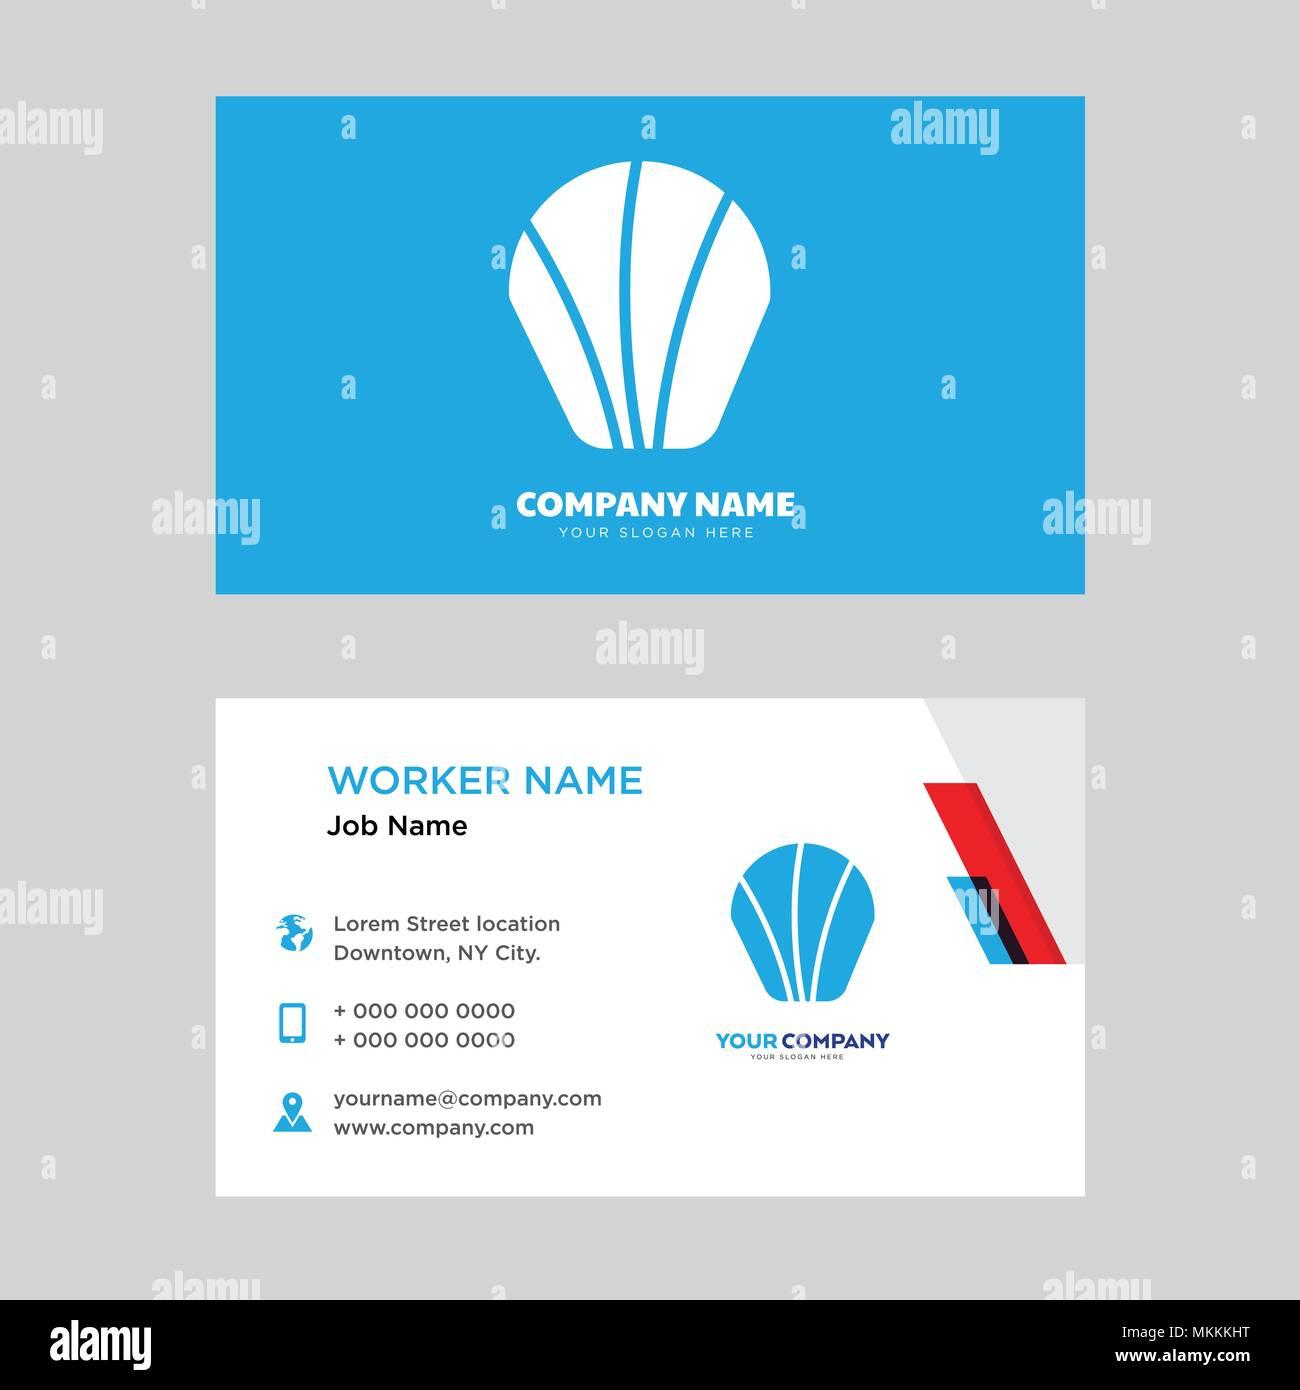 Sea shell business card design template visiting for your company sea shell business card design template visiting for your company modern horizontal identity card vector colourmoves